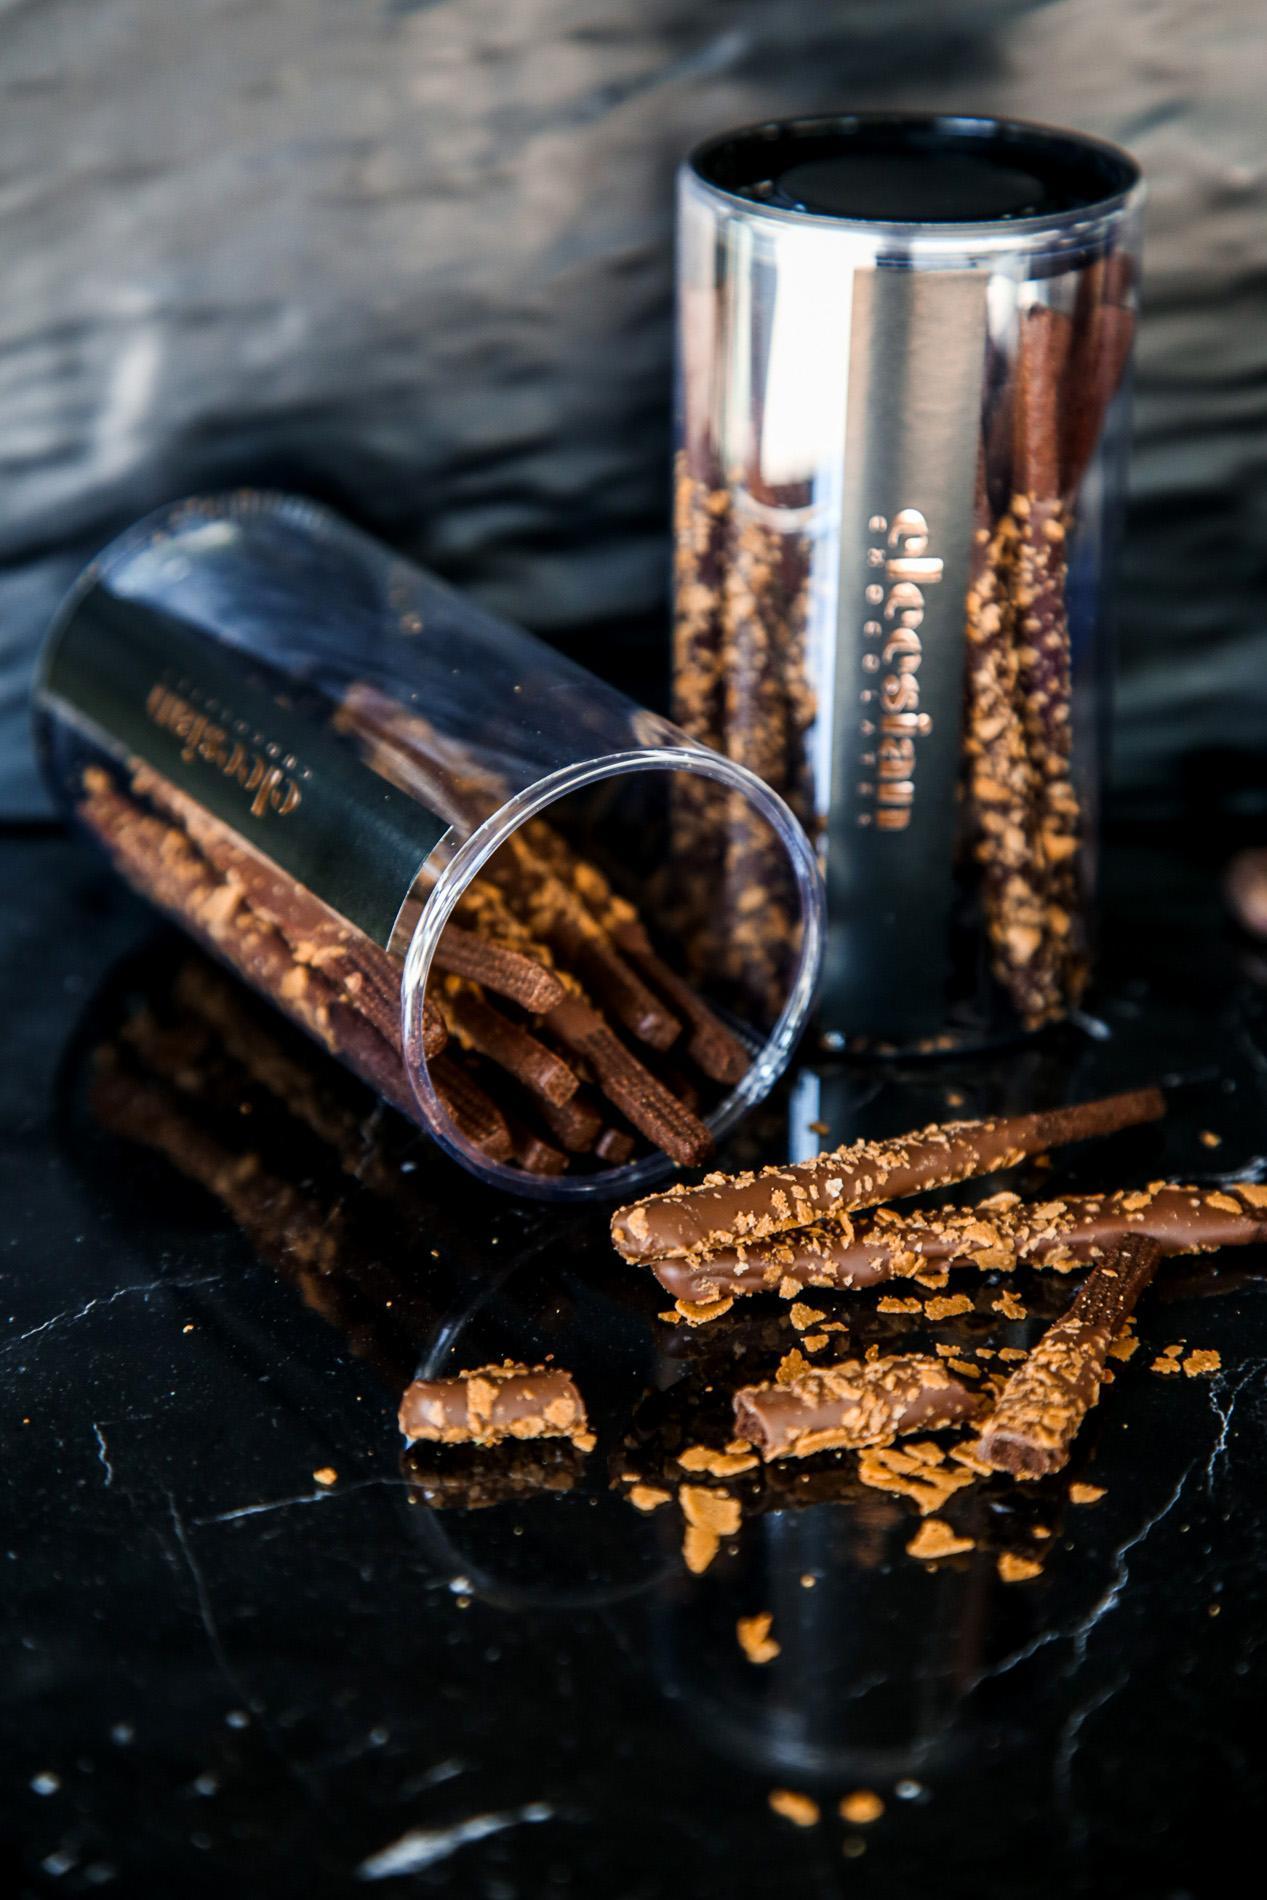 DARK CHOCOLATE - BLUEBERRY STICKES ECUADOR 70%